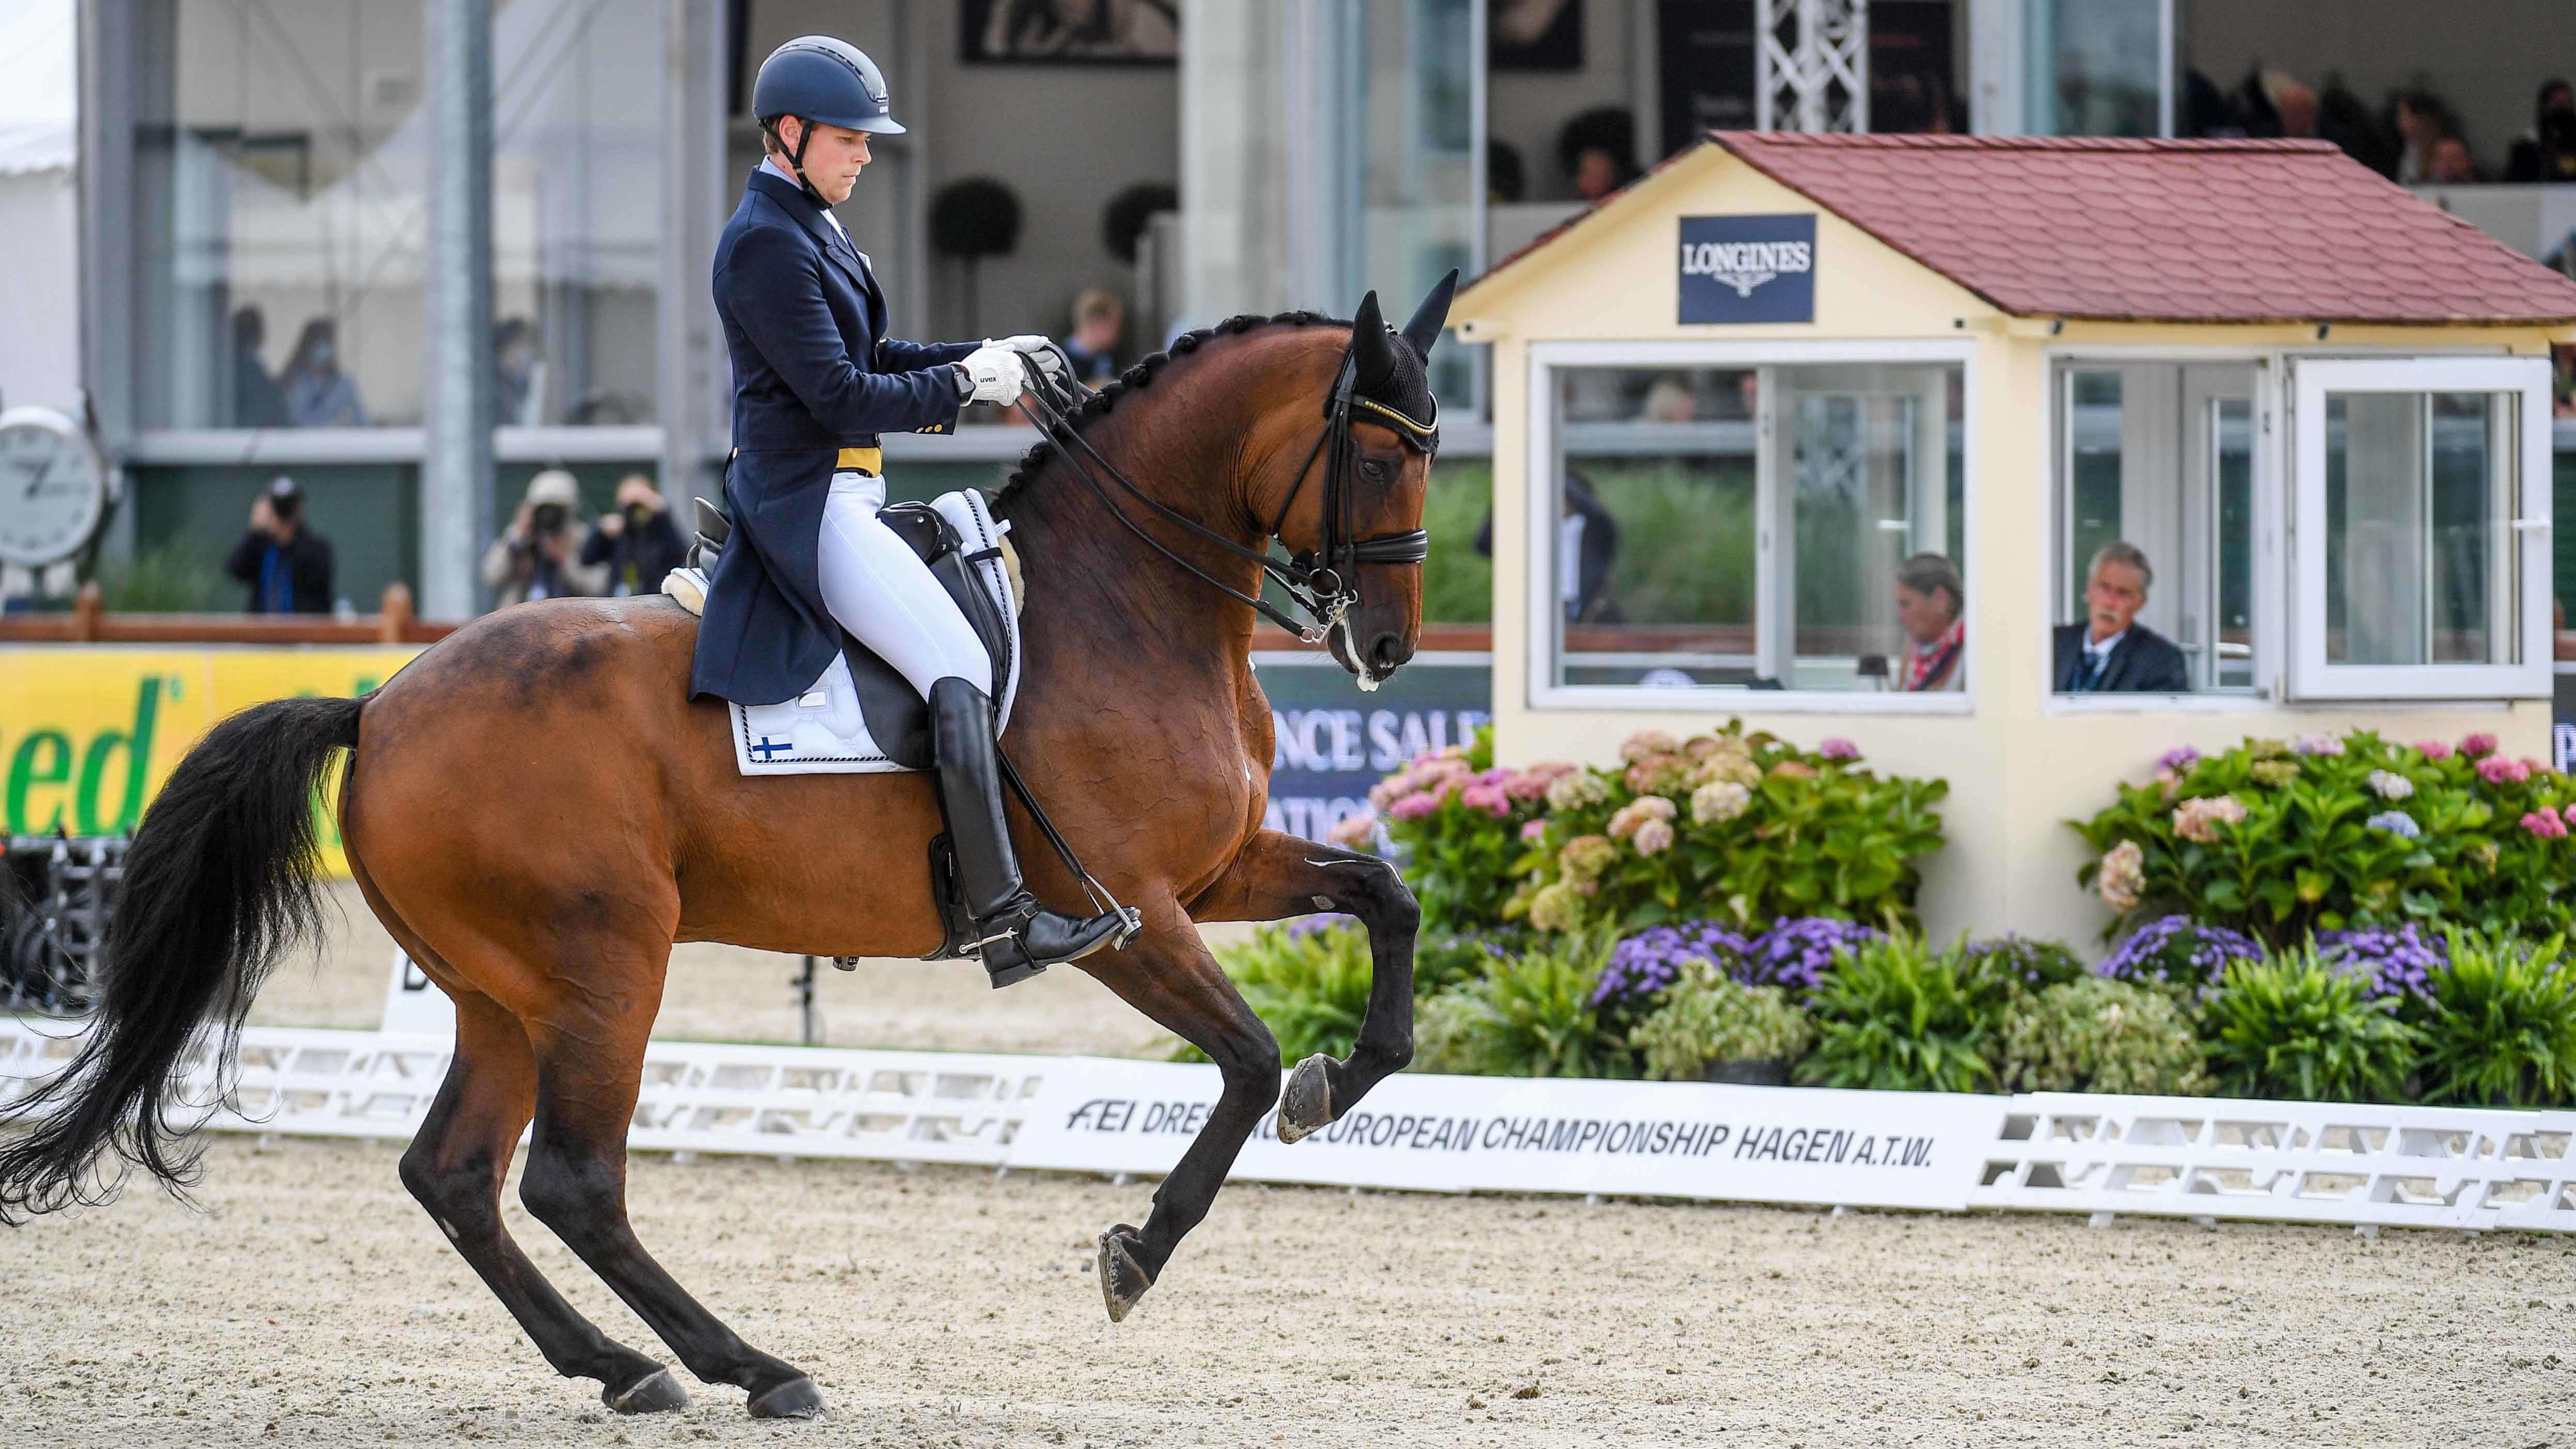 henri Ruoste hevosensa Konstestro Db:n kanssa EM-kisojen finaalissa.